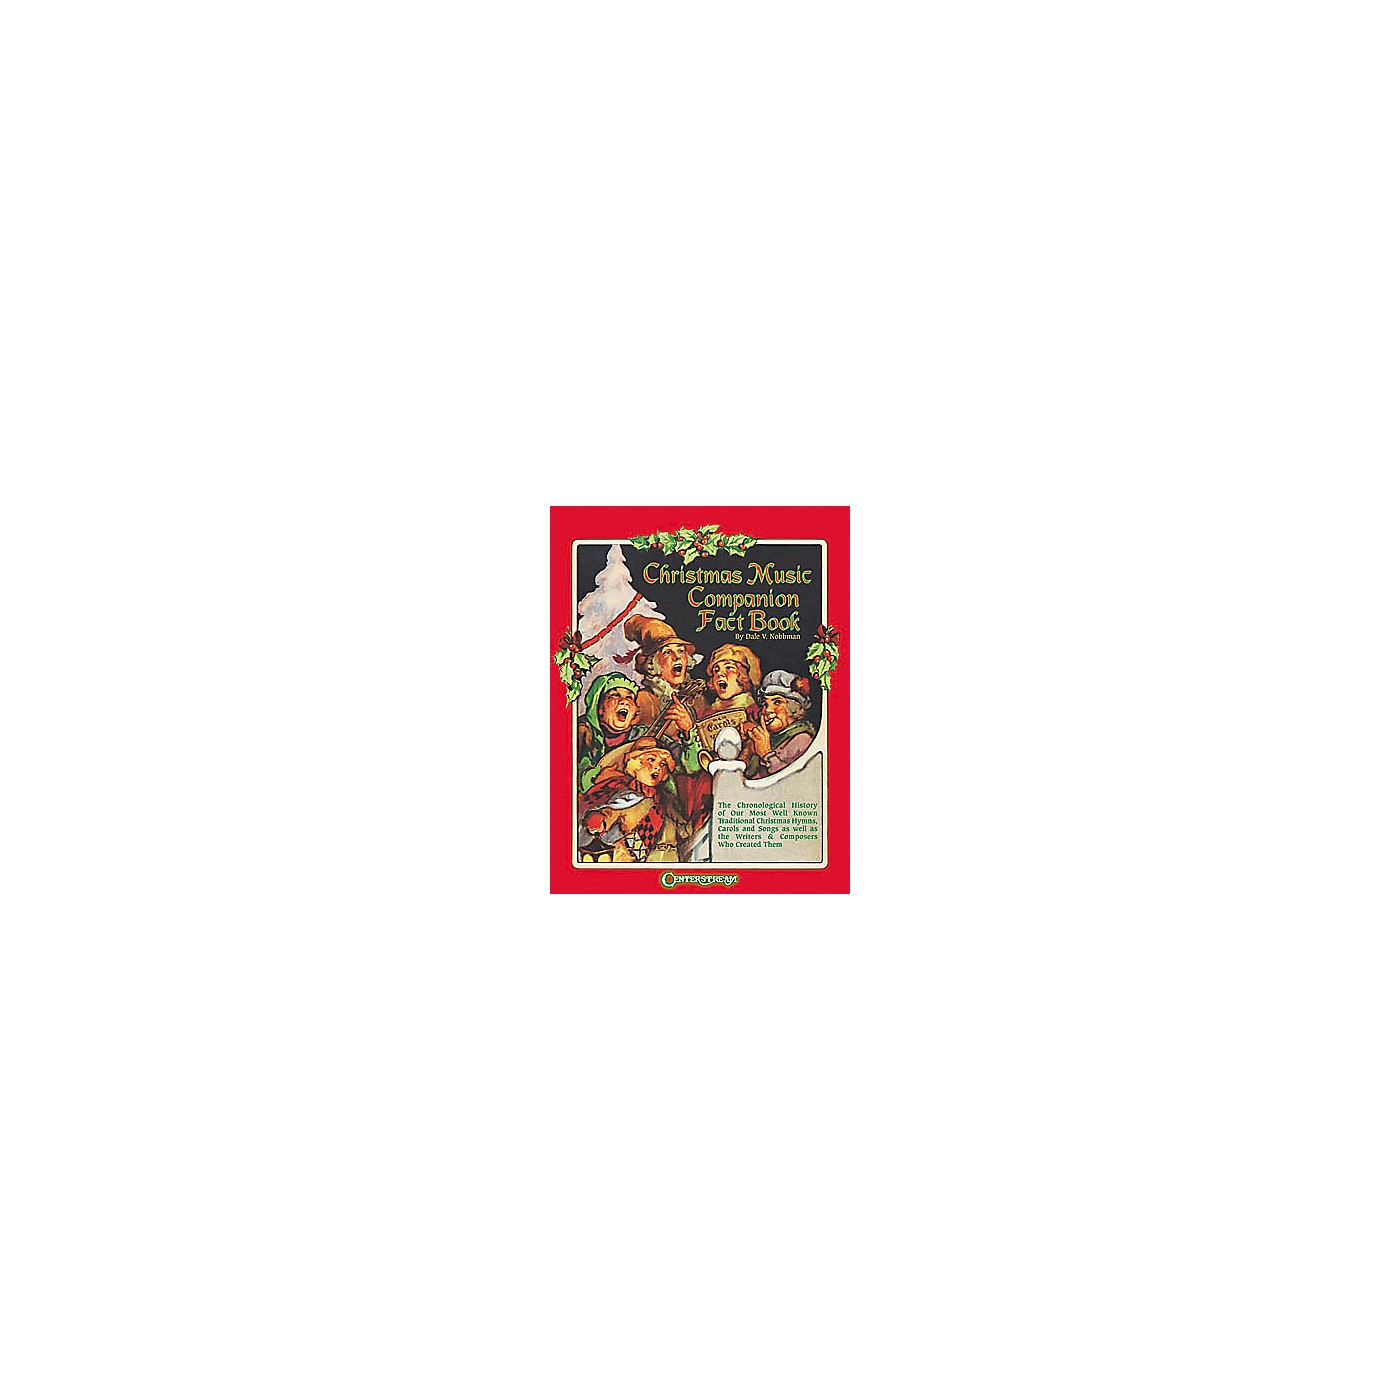 Centerstream Publishing Christmas Music Companion Fact Book thumbnail